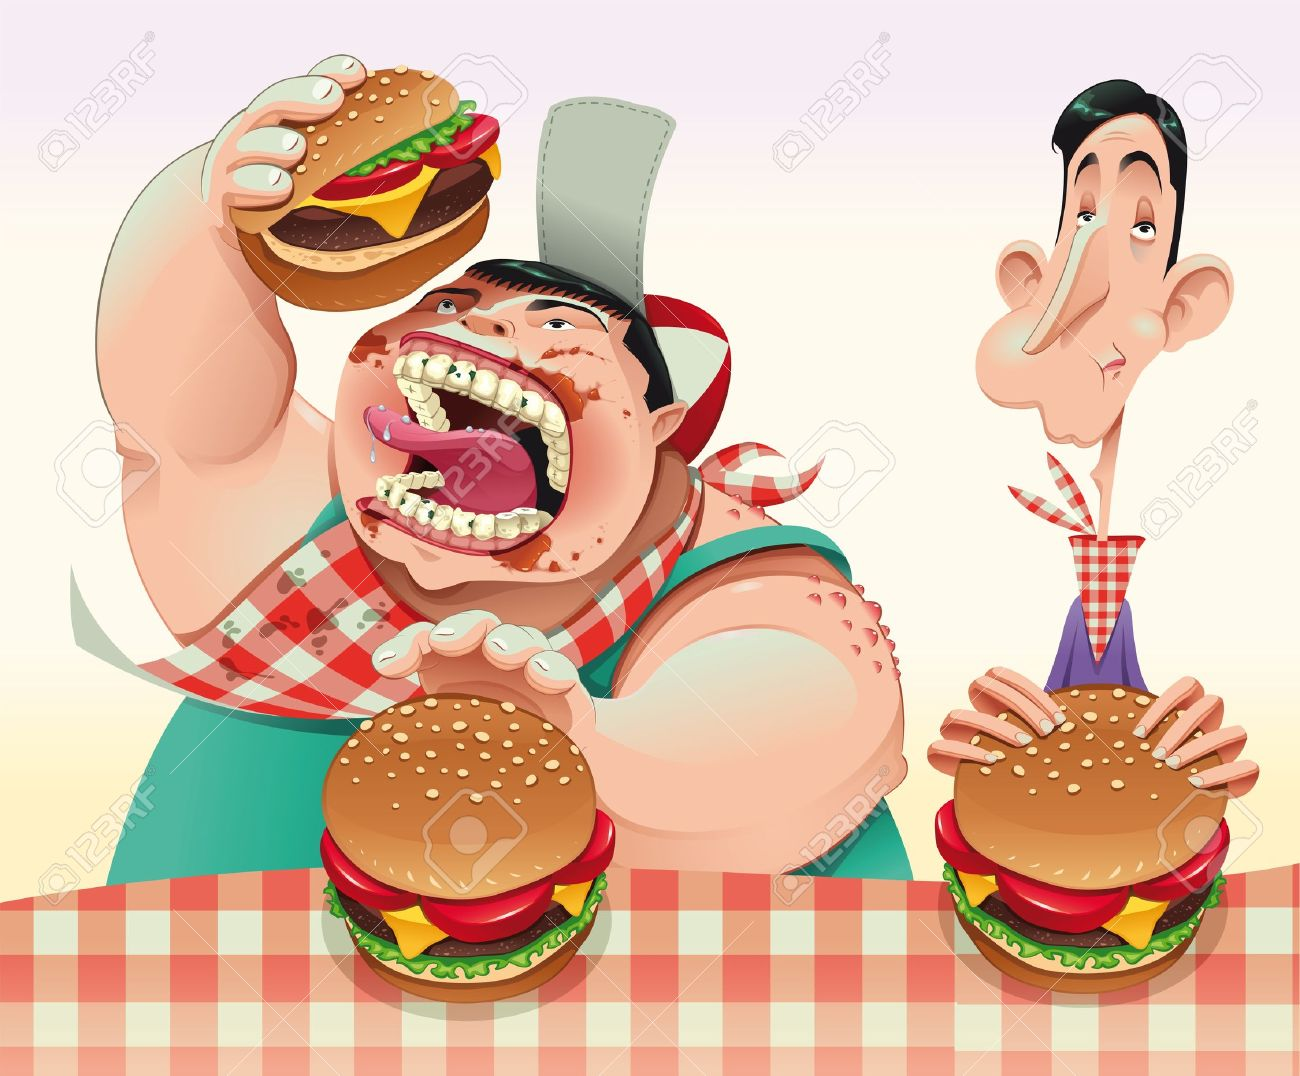 Guys With Hamburgers. Cartoon And Vector Illustration. Royalty.